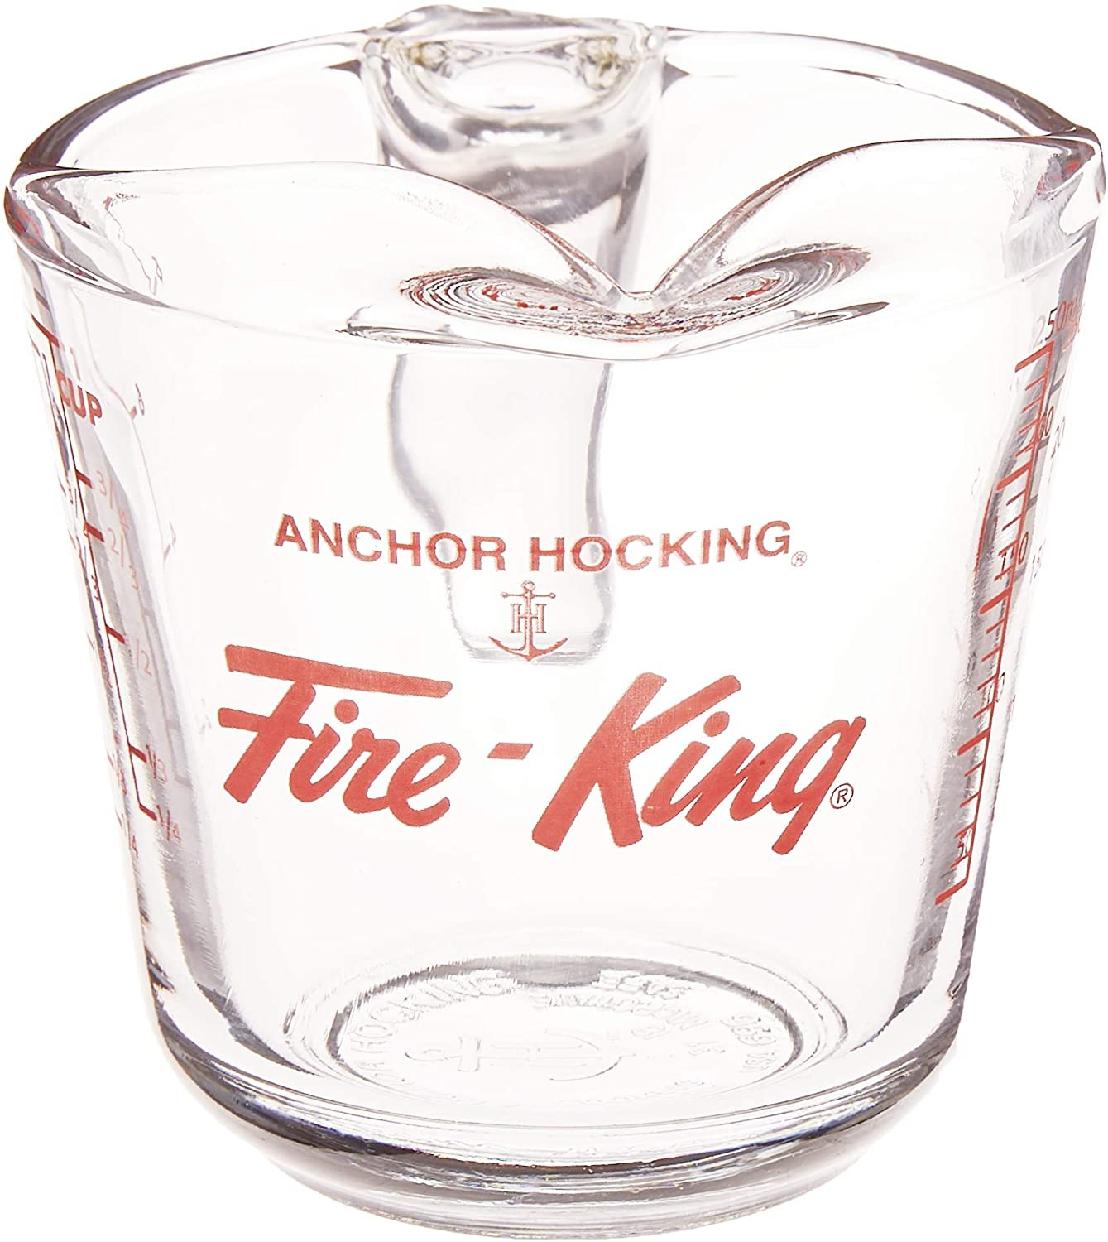 Fire King(ファイヤーキング) メジャリングカップ 250mlの商品画像4